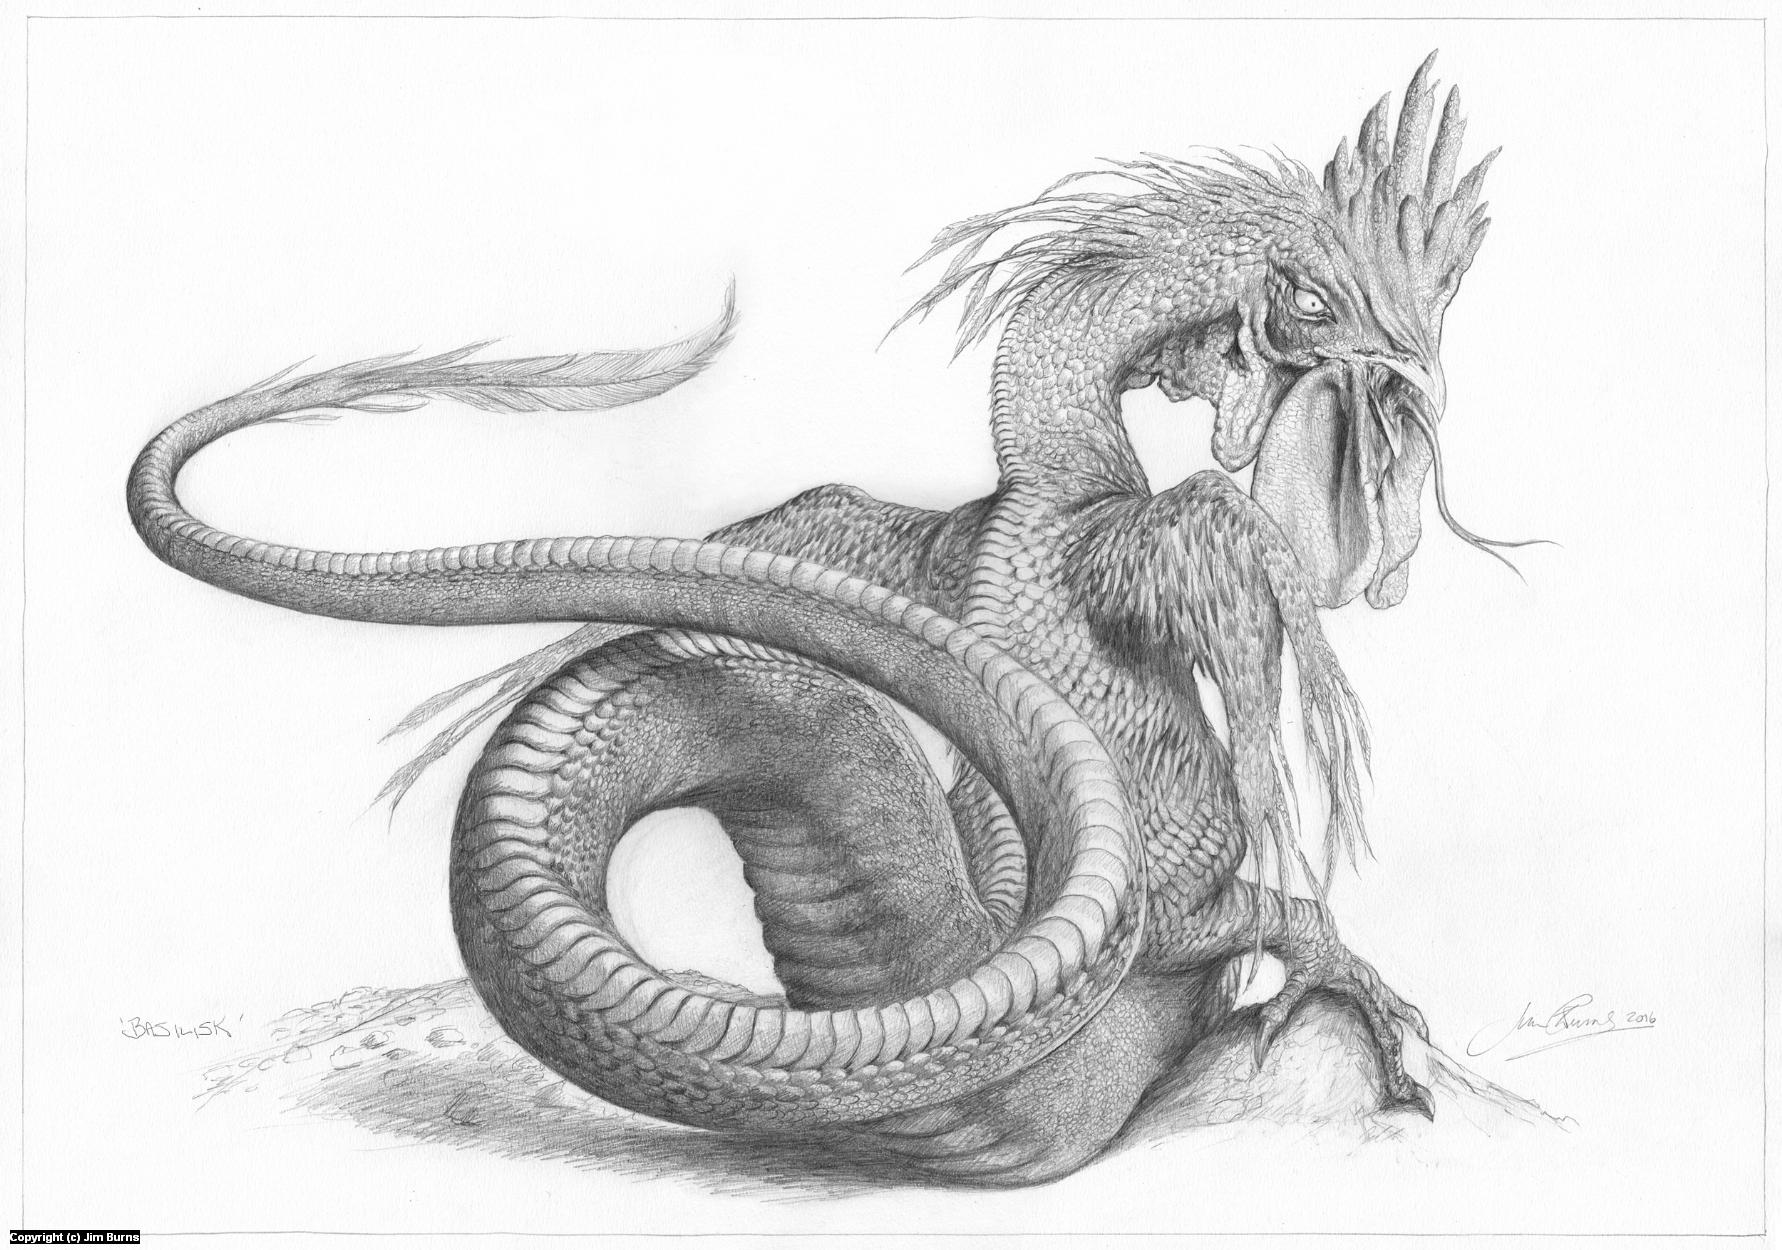 'Basilisk' Artwork by Jim Burns